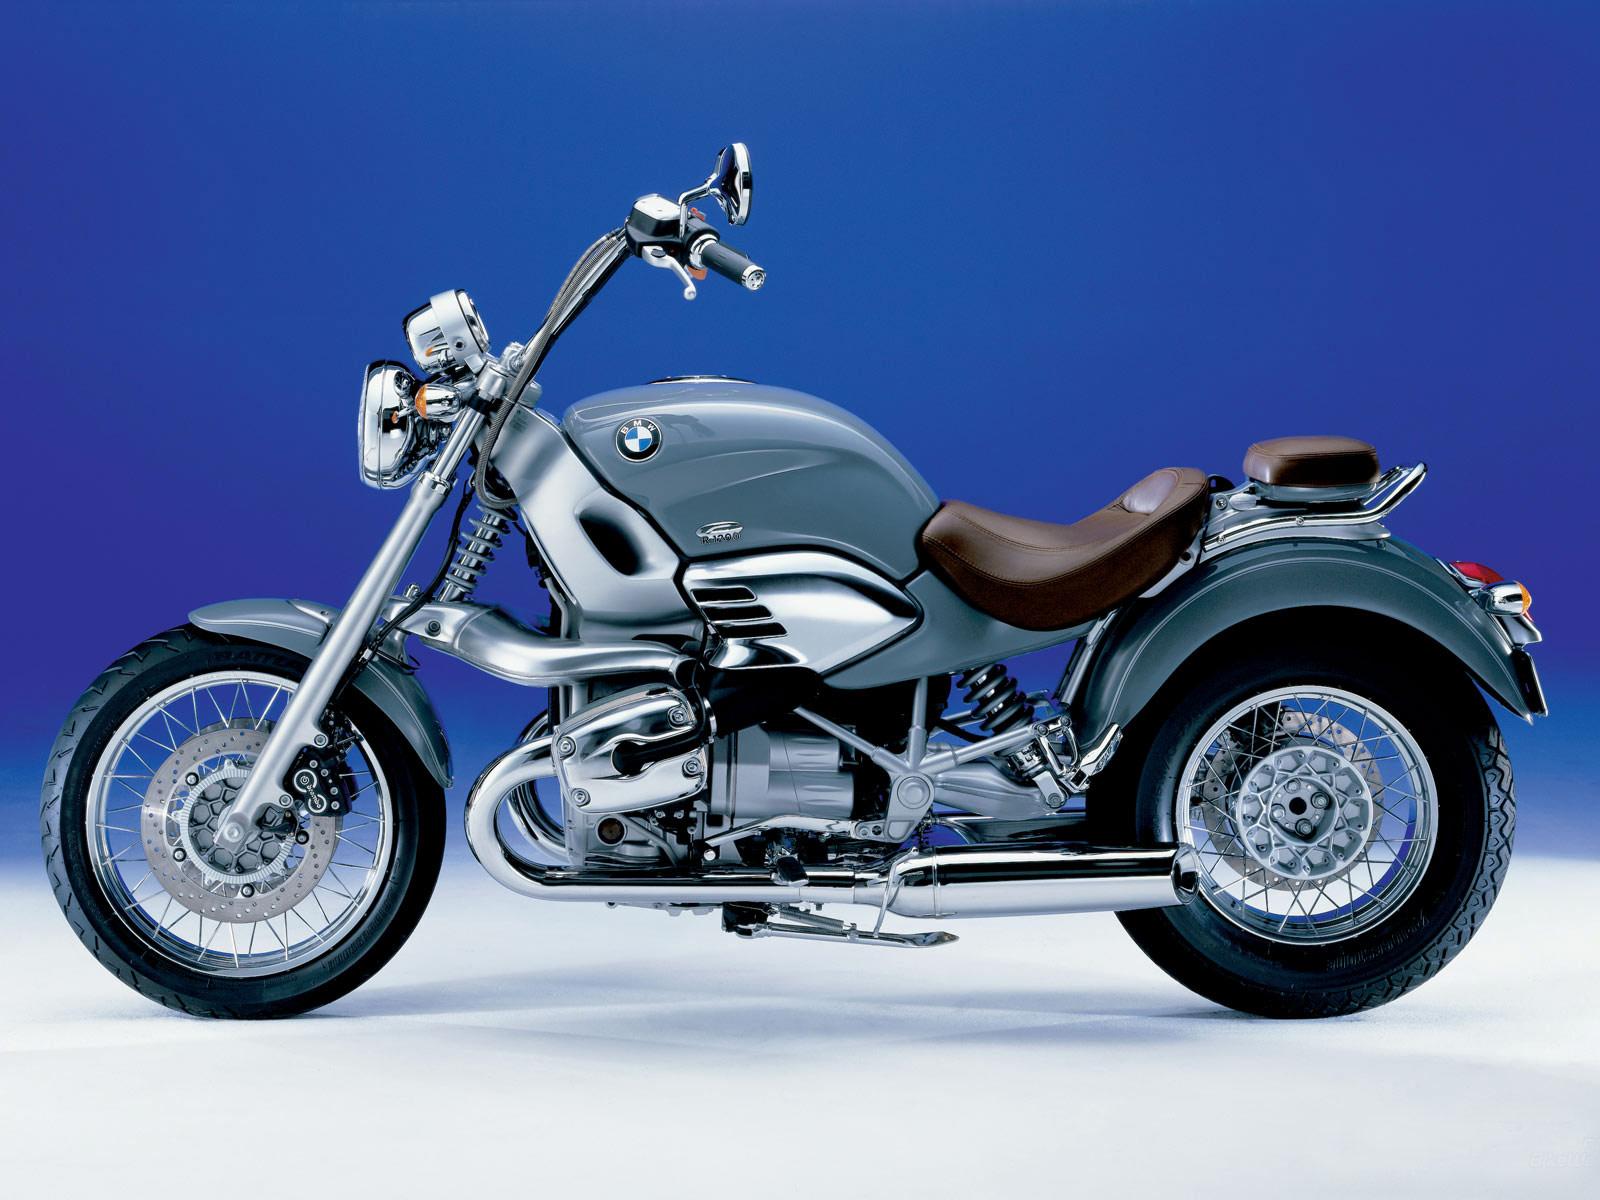 http://2.bp.blogspot.com/-yggYL1j0ibM/Th7bSrtoriI/AAAAAAAAAHY/2wH60cOgwK4/s1600/BMW-desktop-wallpapers_R1200C_Classic_BMW_motorcycle_2000.jpg